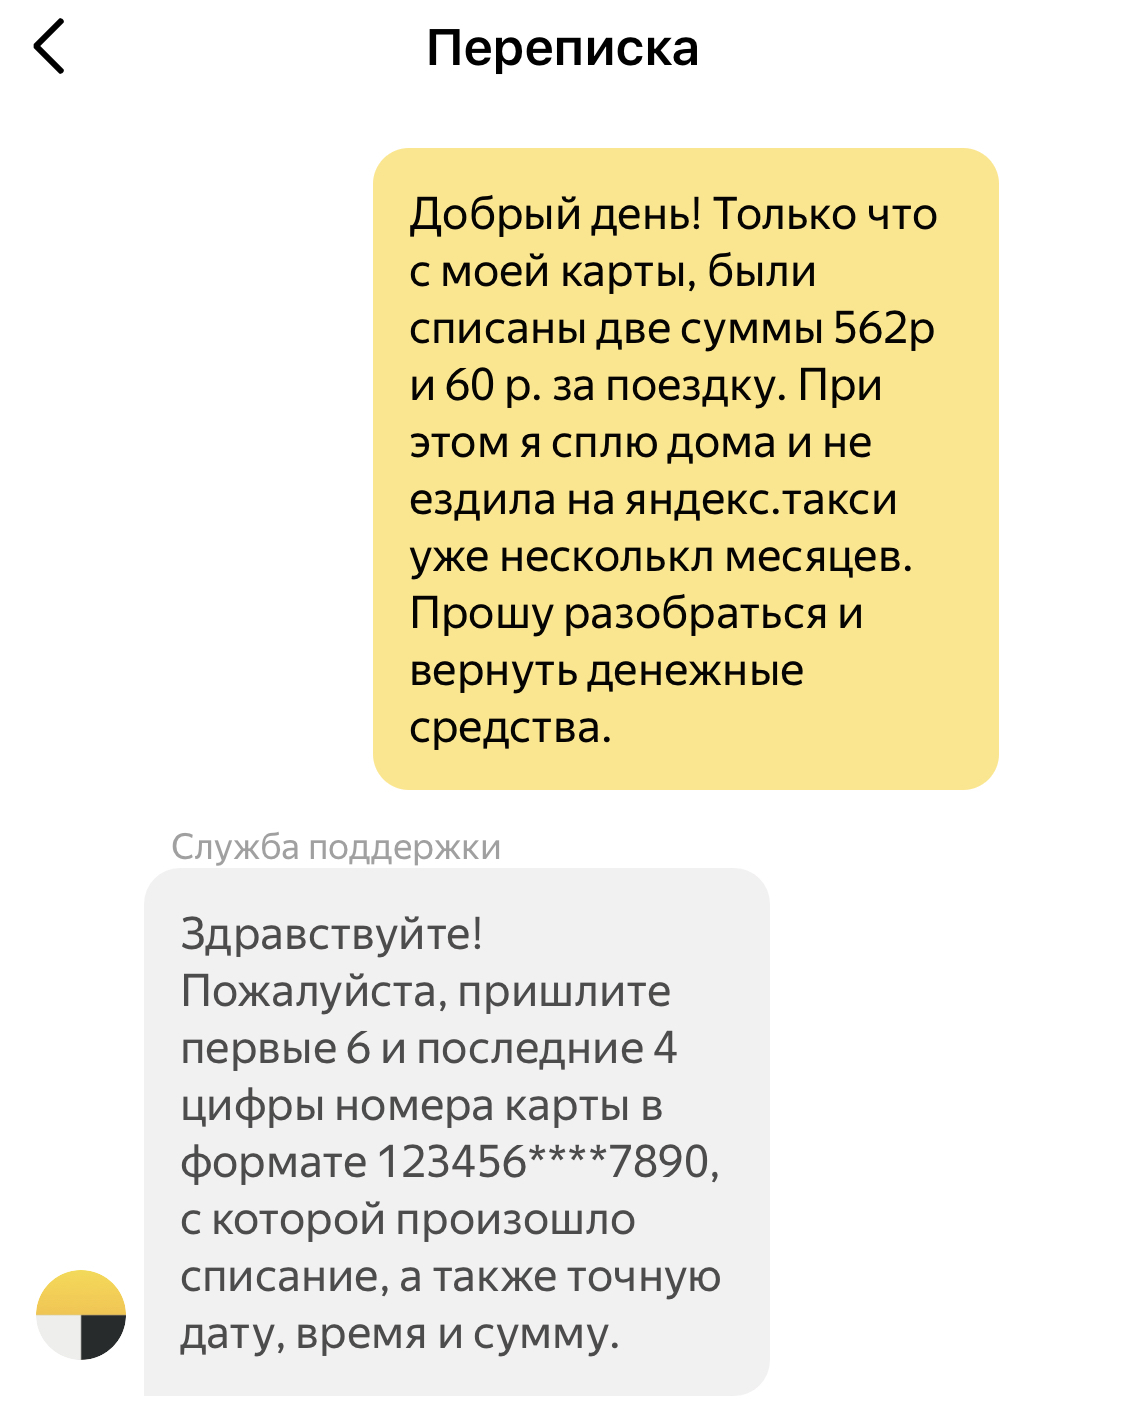 Займы онлайн наличными без проверок с решением сразу москва